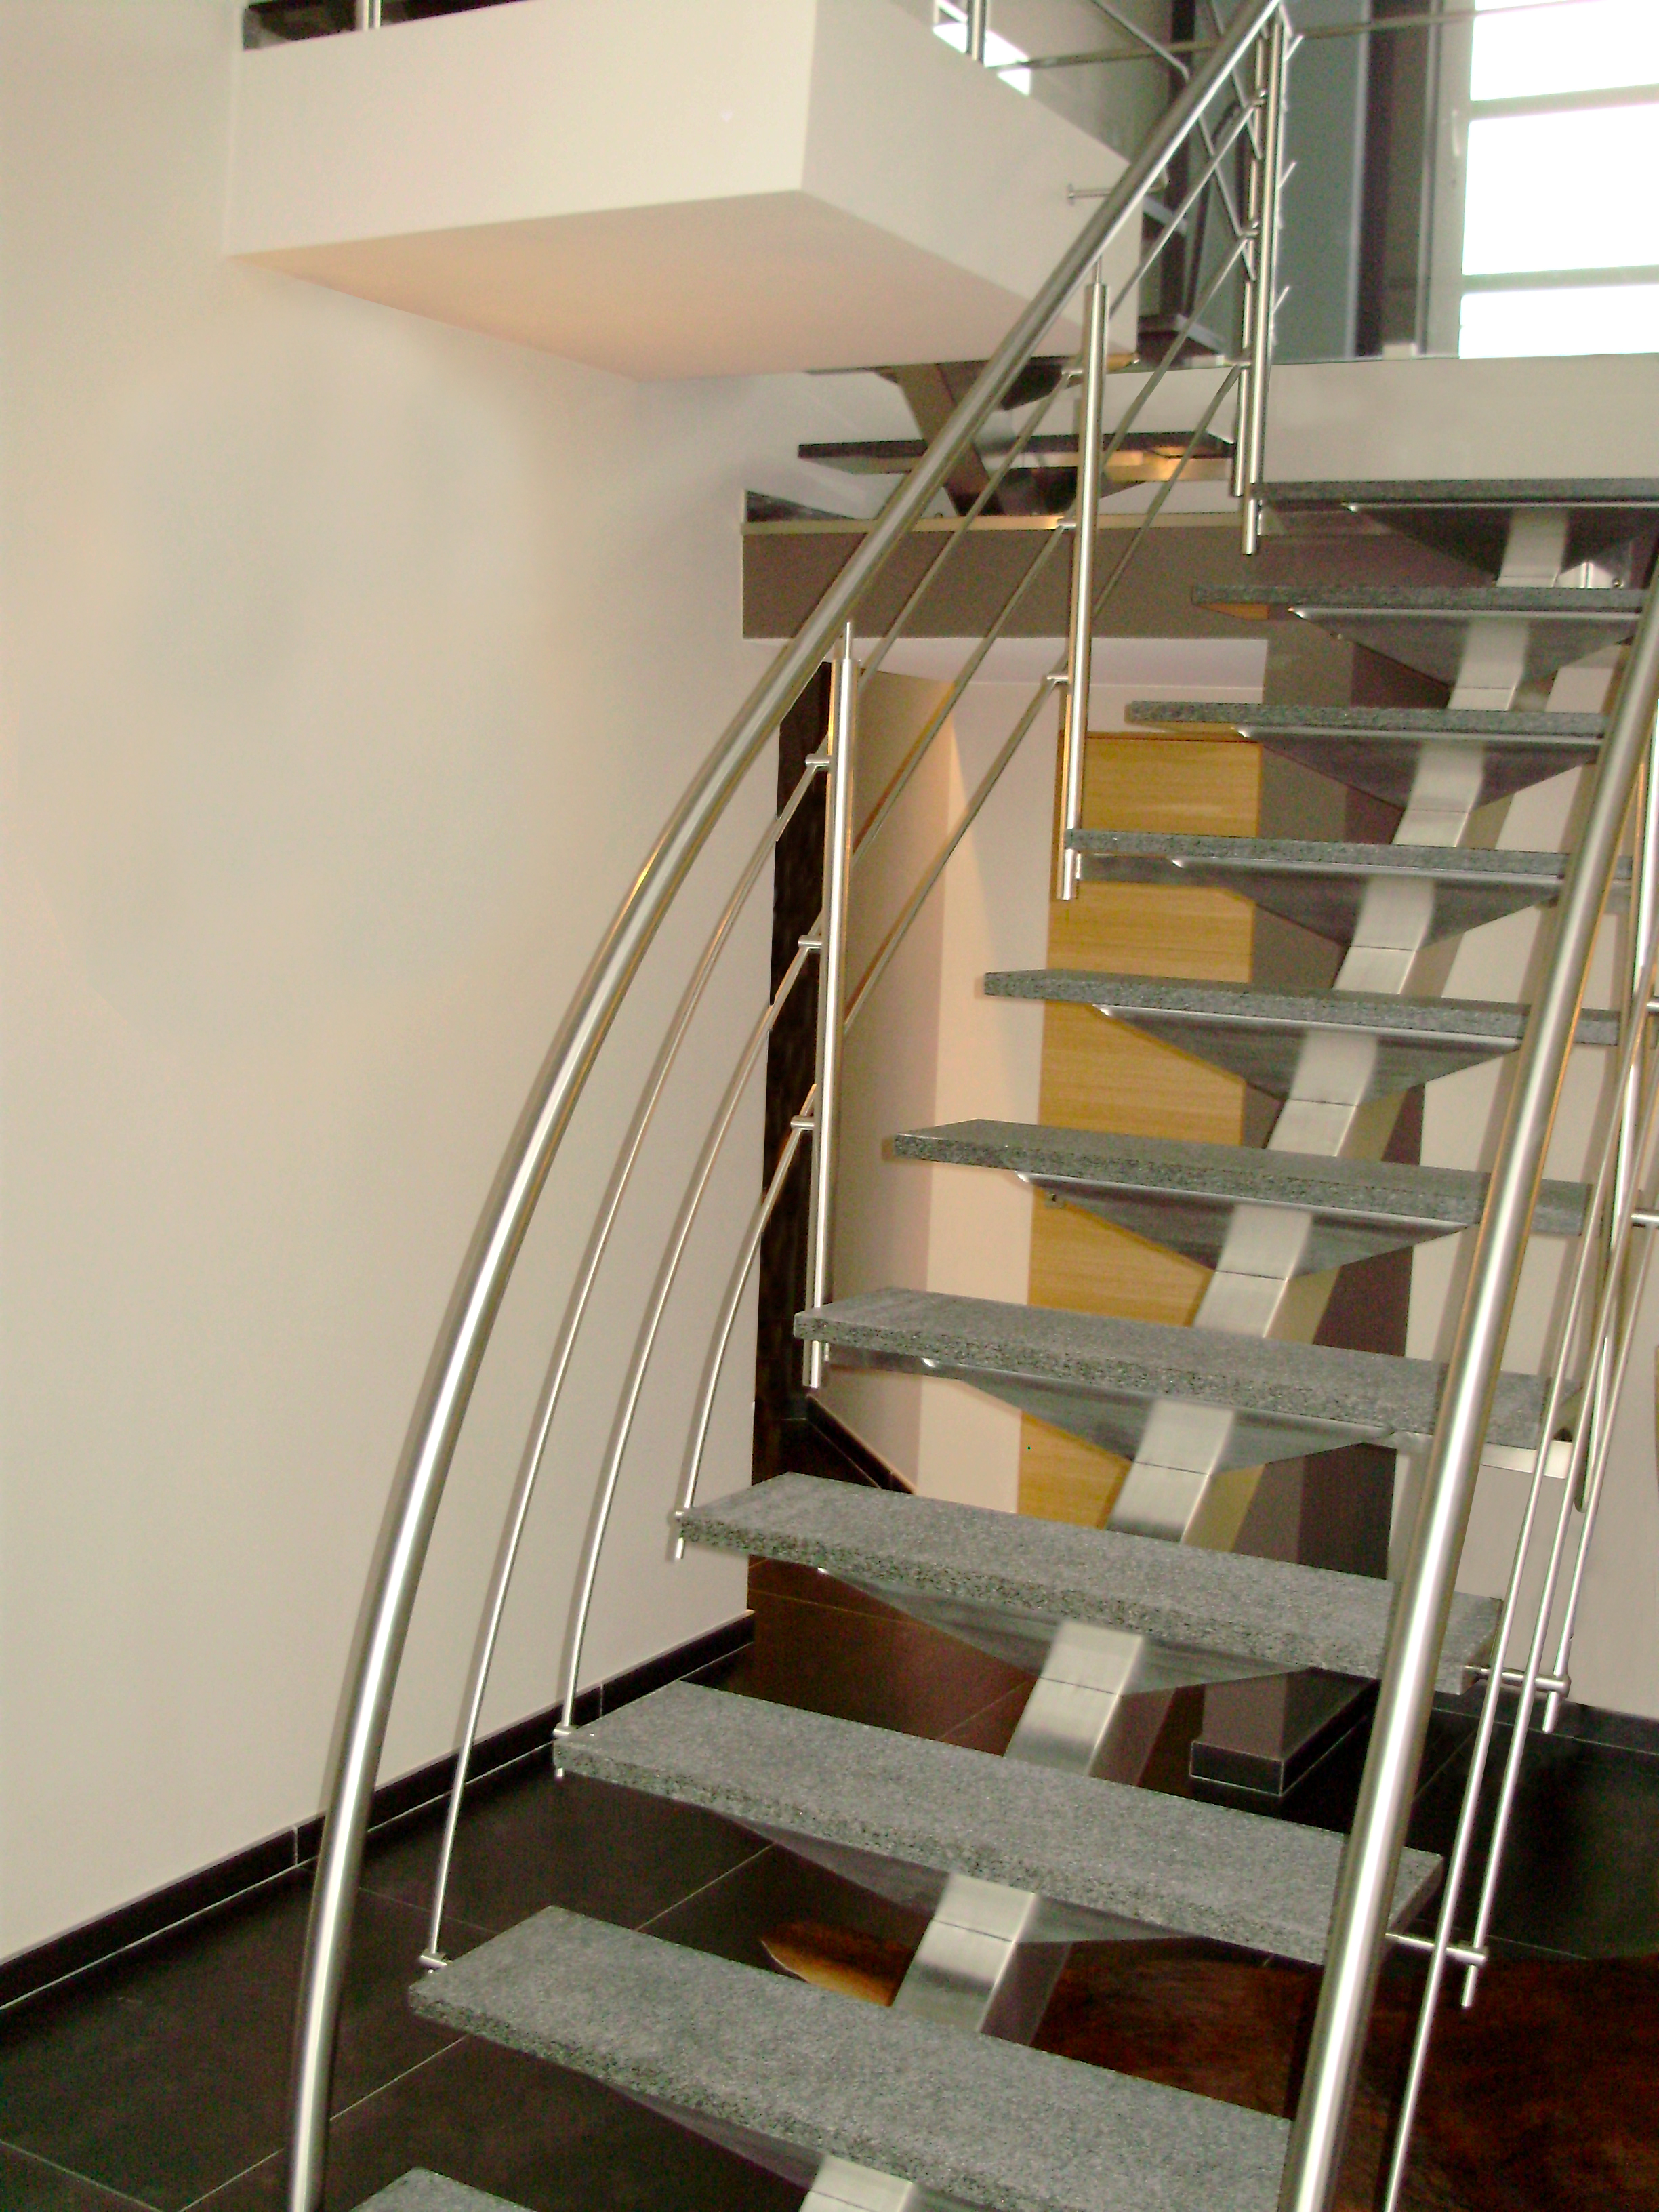 Barriere Escalier En Colimaçon inox concept